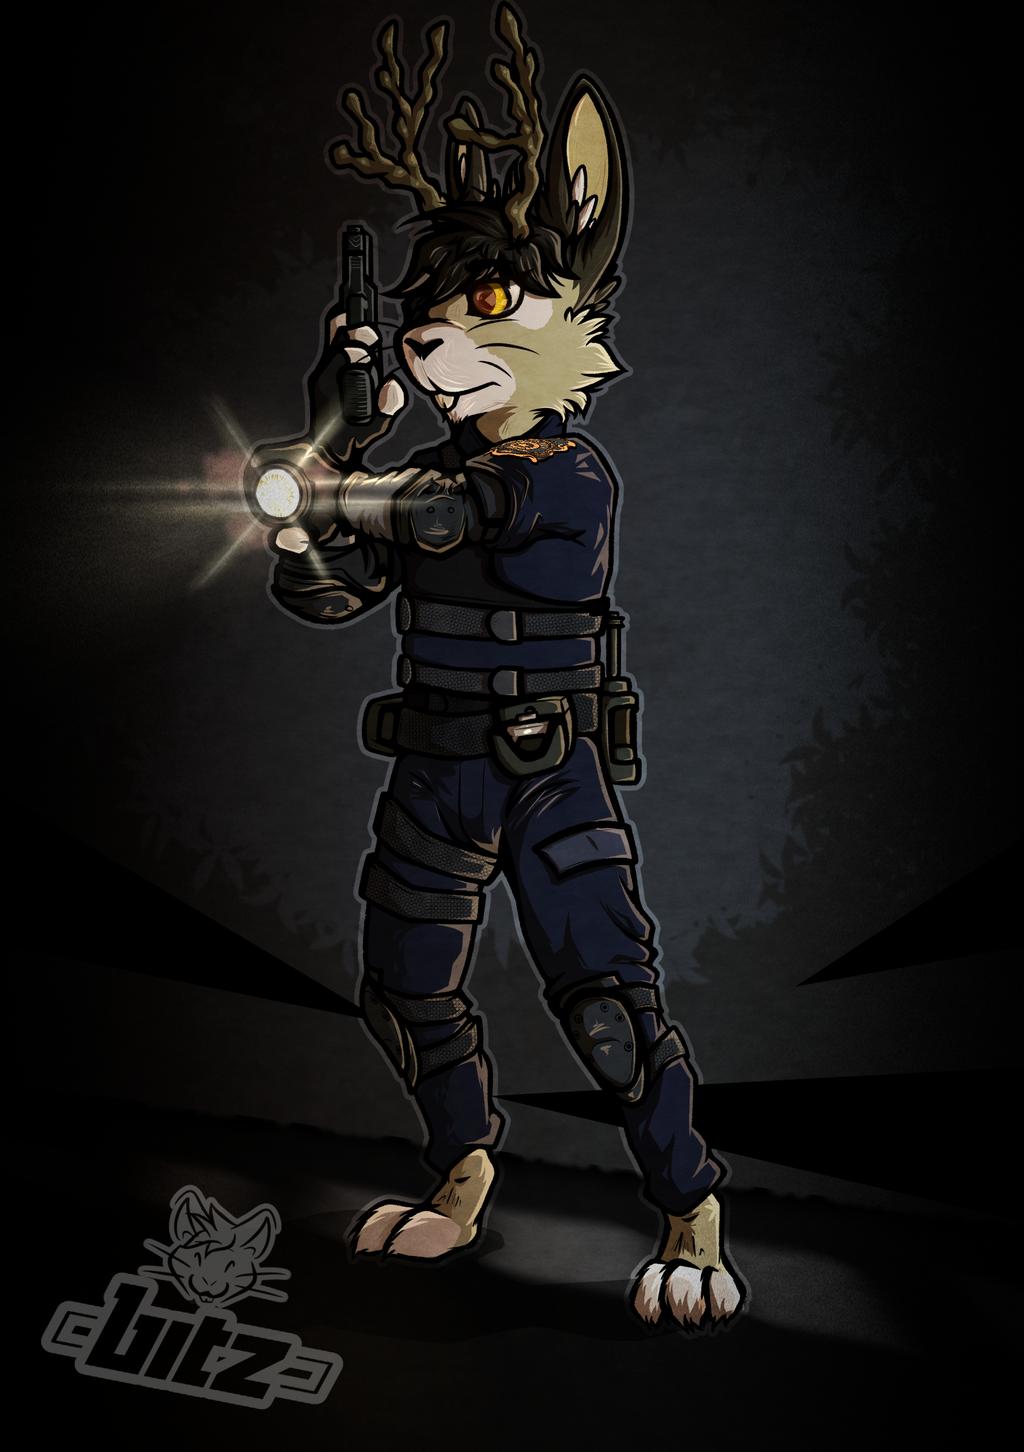 [G] Ready For Raccoon City